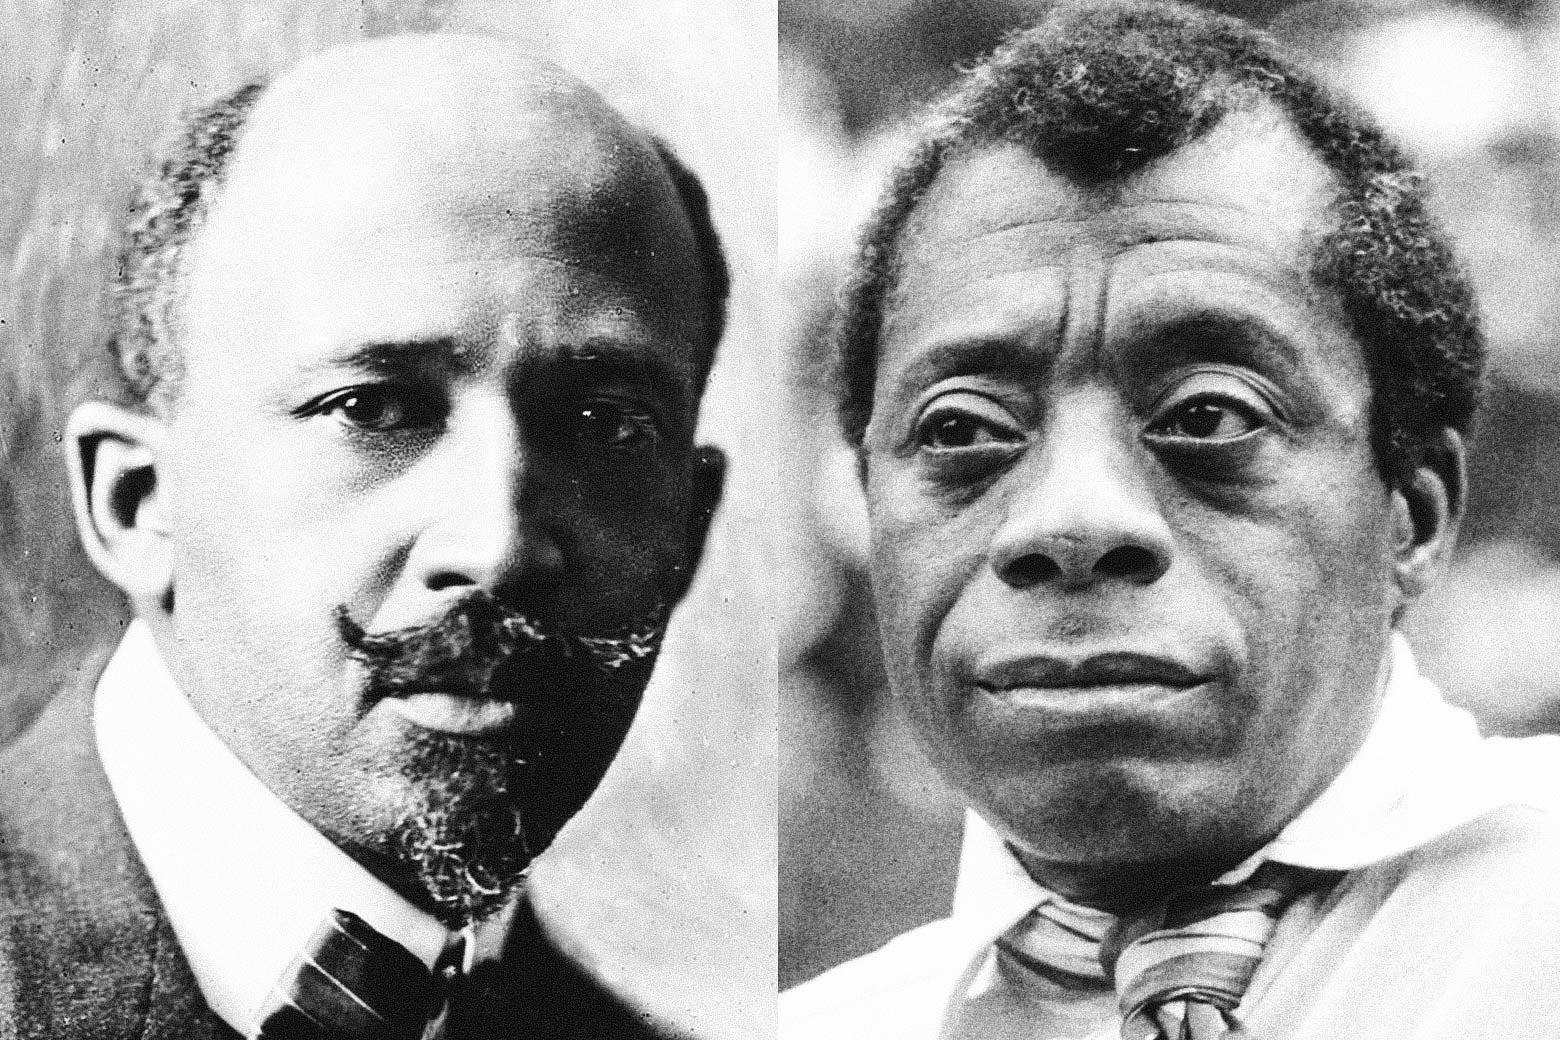 W.E.B Du Bois and James Baldwin.